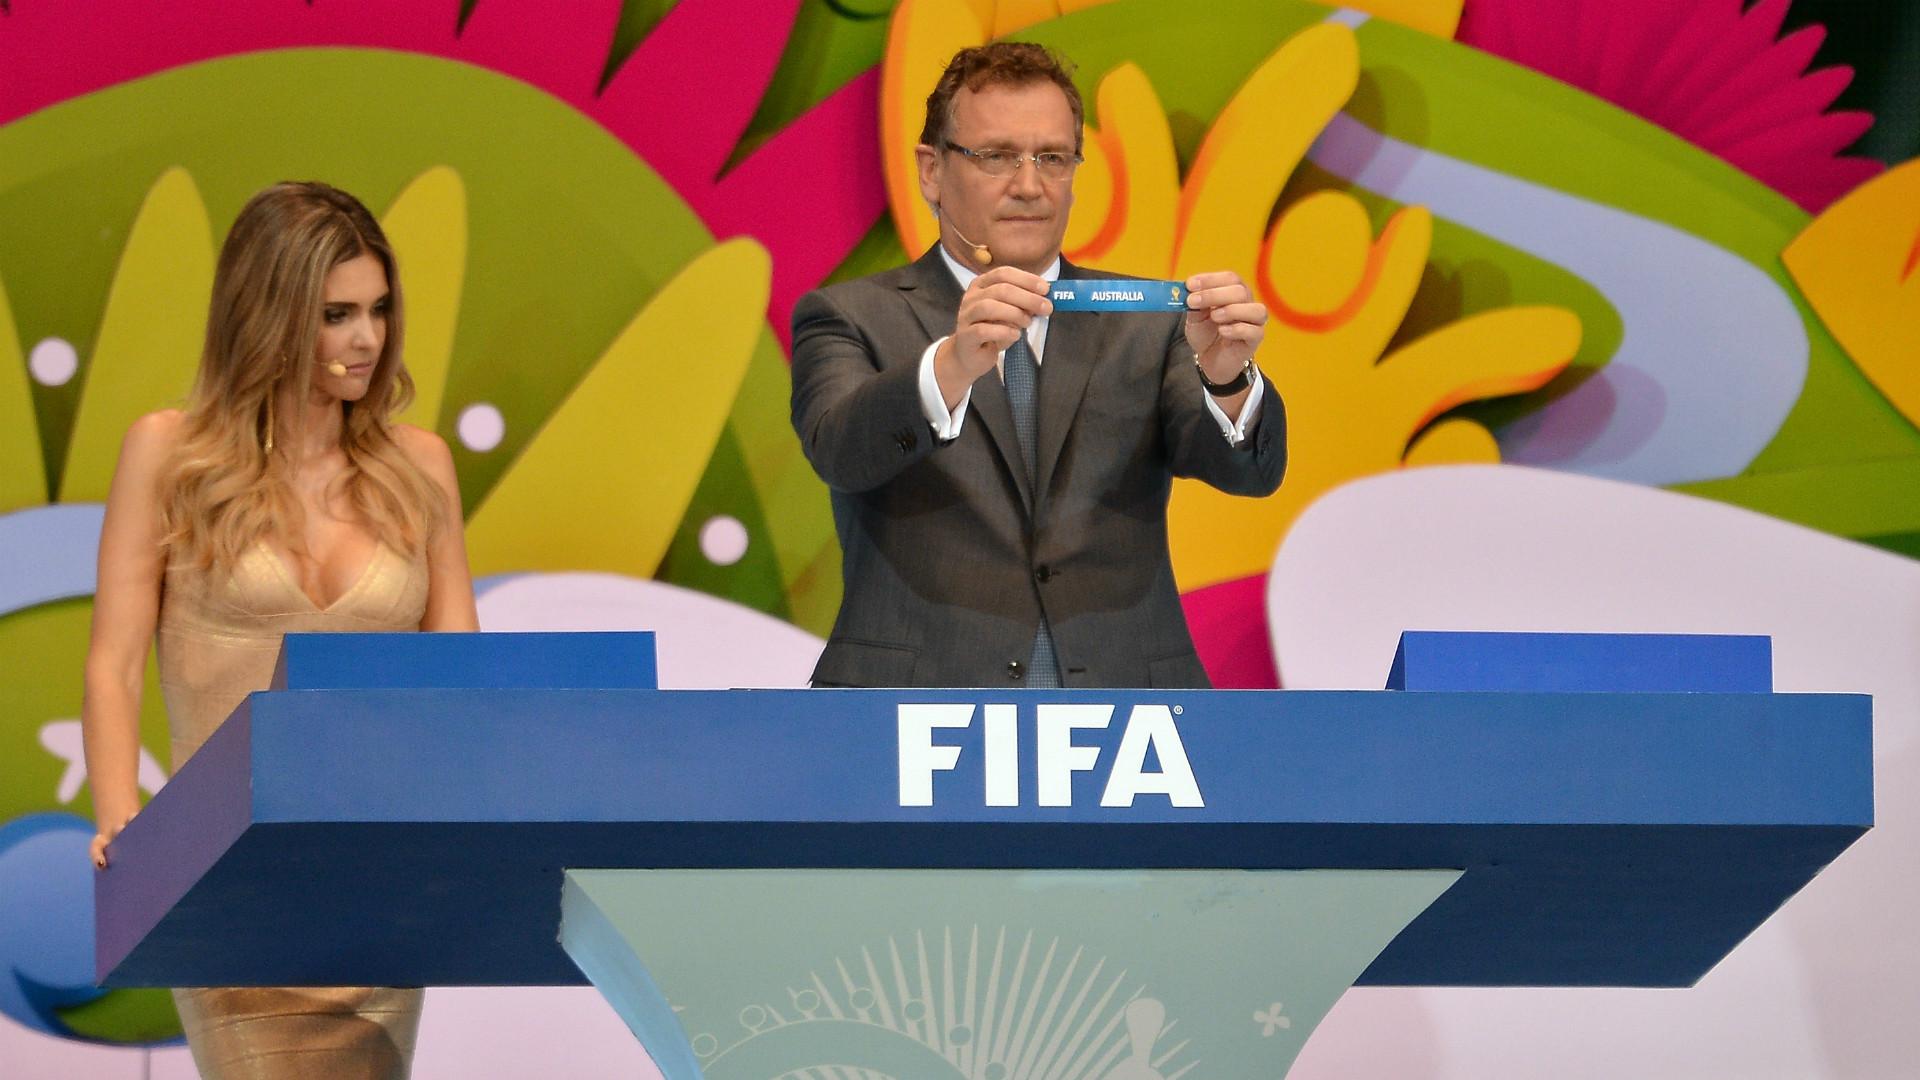 FIFA World Cup 2014 draw